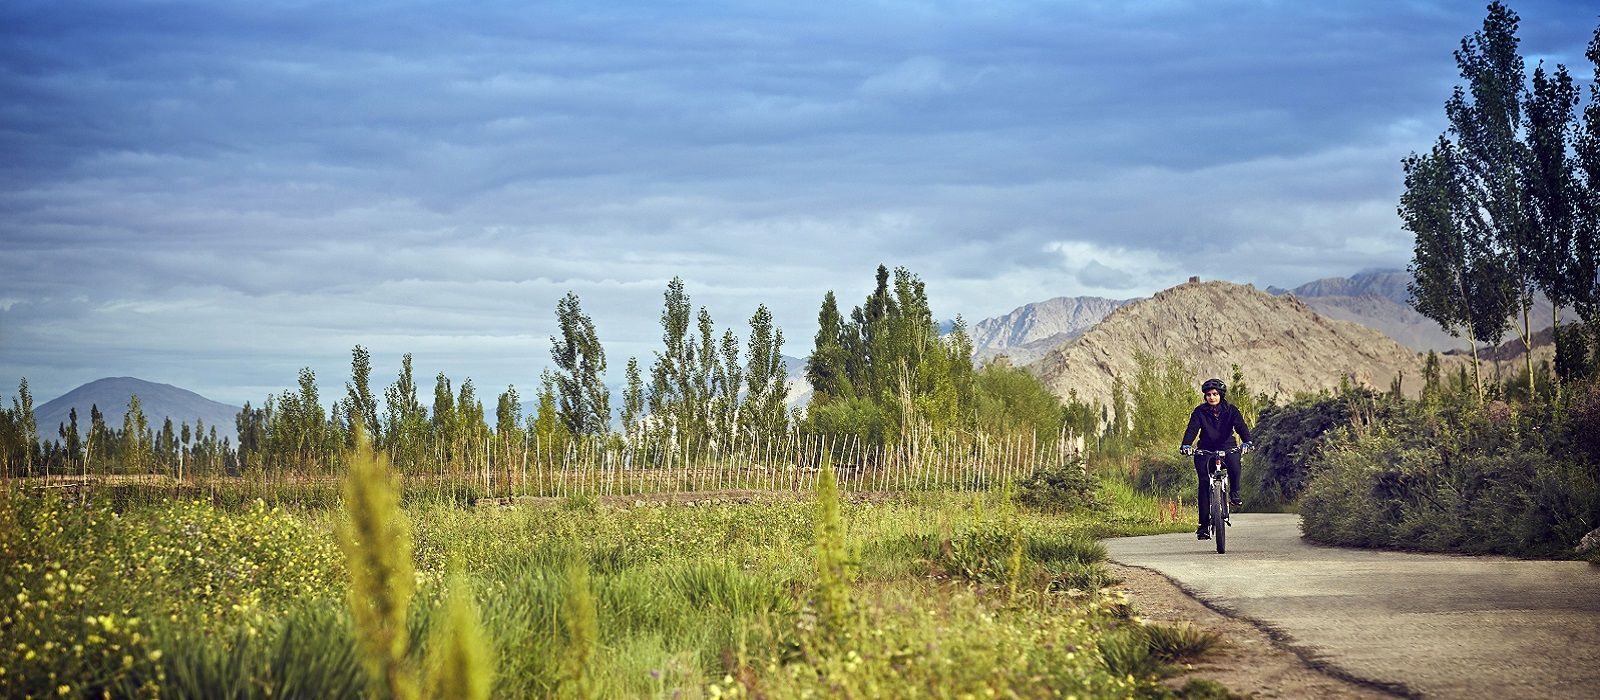 Destination Nubra Valley Himalayas